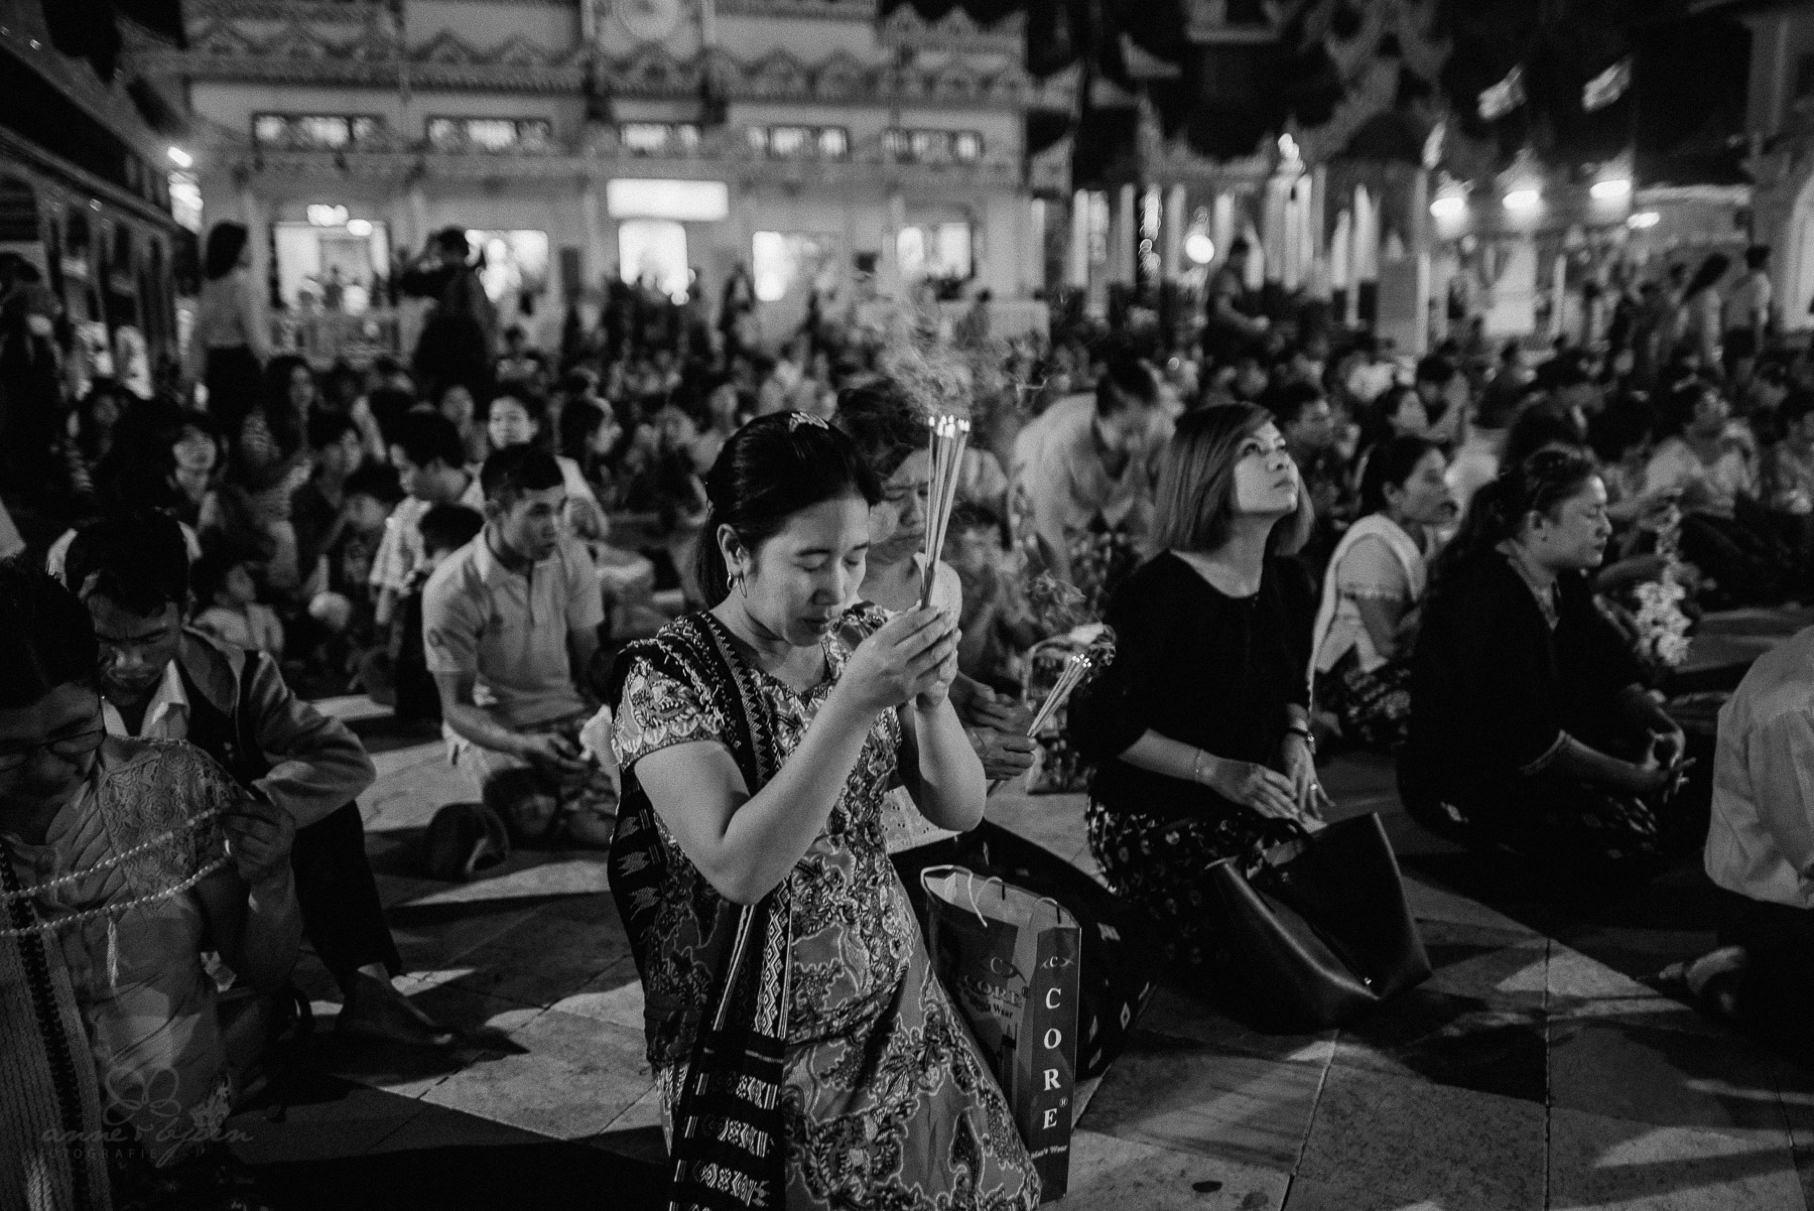 0025 yangon mandalay d76 4699 - Großstädte Myanmars - Yangon & Mandalay